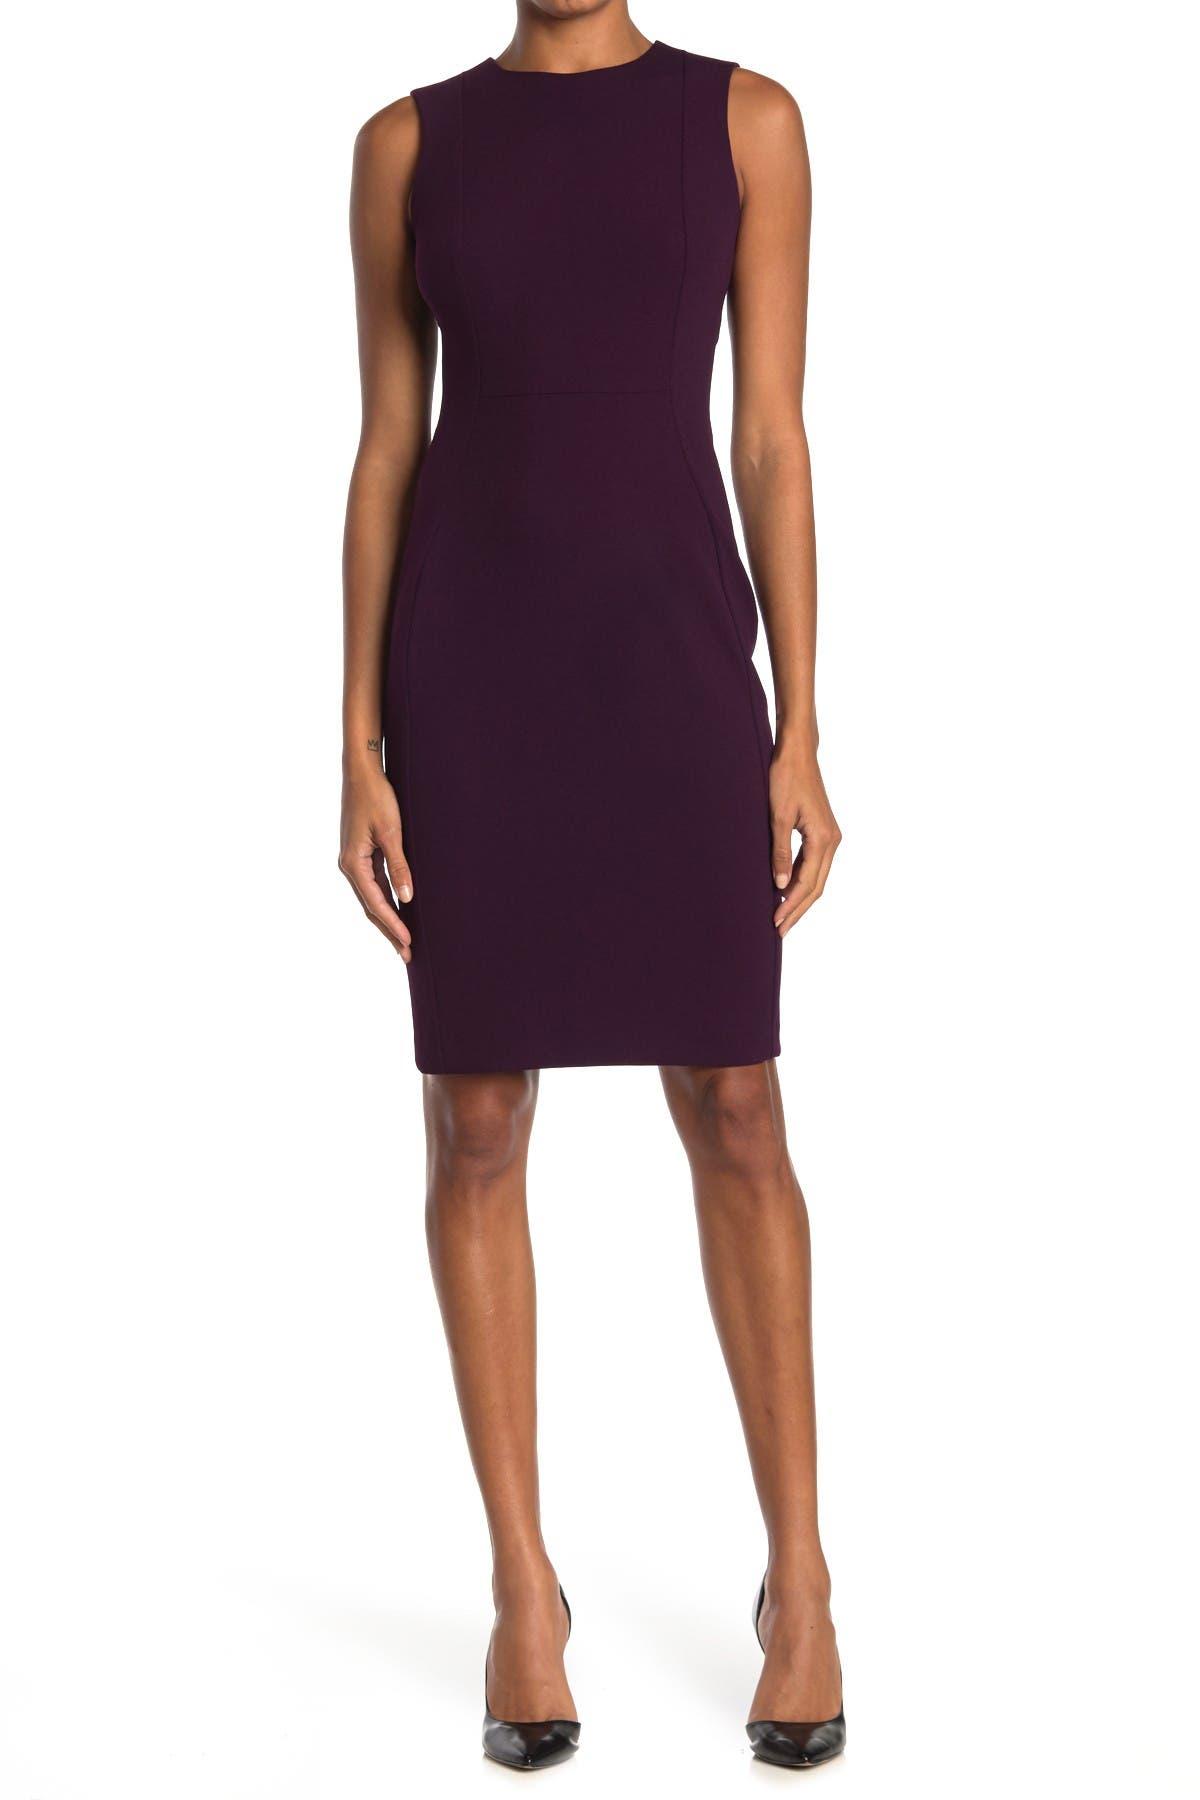 Image of Calvin Klein Sleeveless Sheath Dress